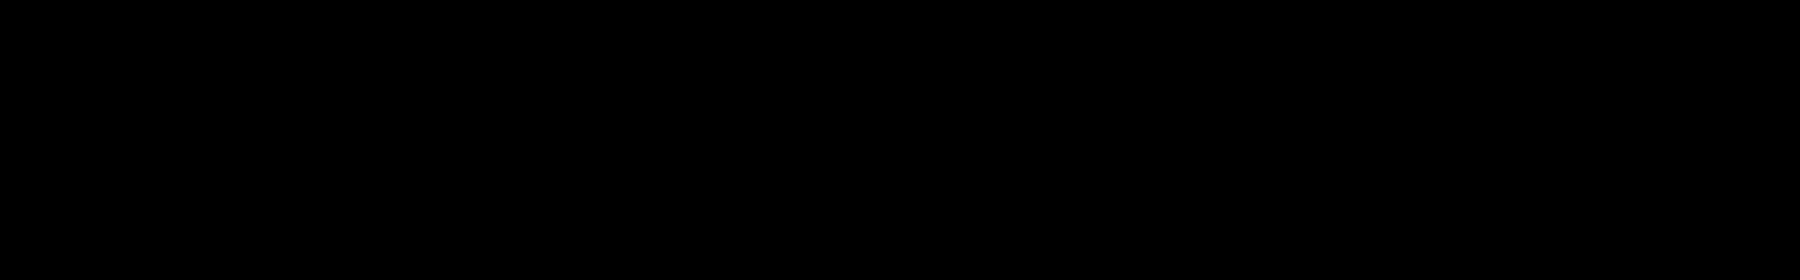 Ambient Electronica audio waveform